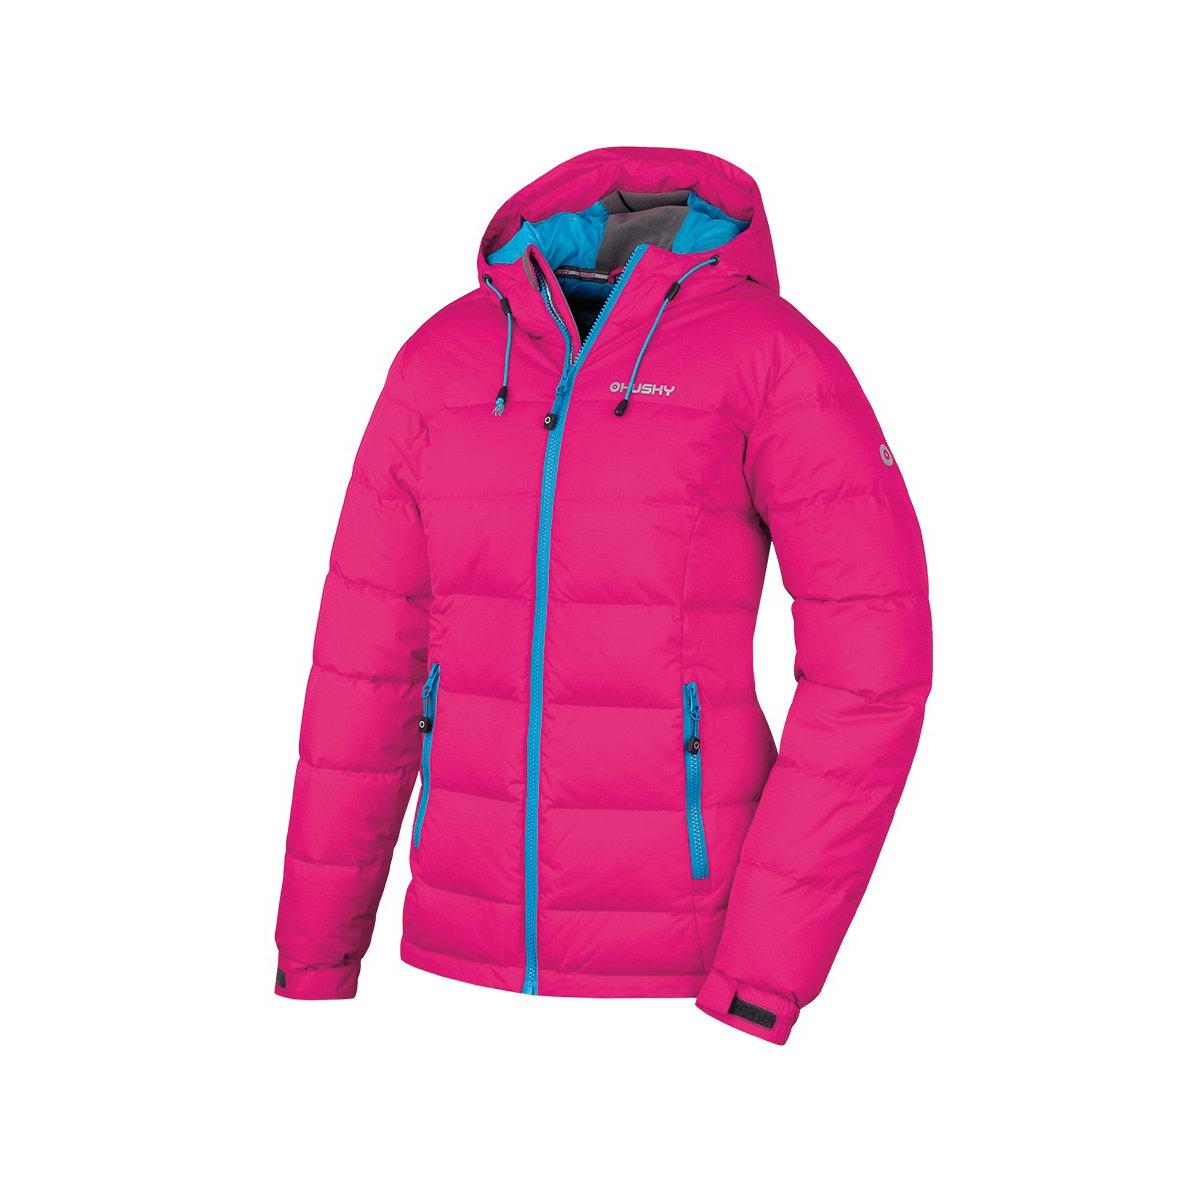 2cdd675659e6 dámska zimná bunda HUSKY Heral L ružová - BERG SPORT